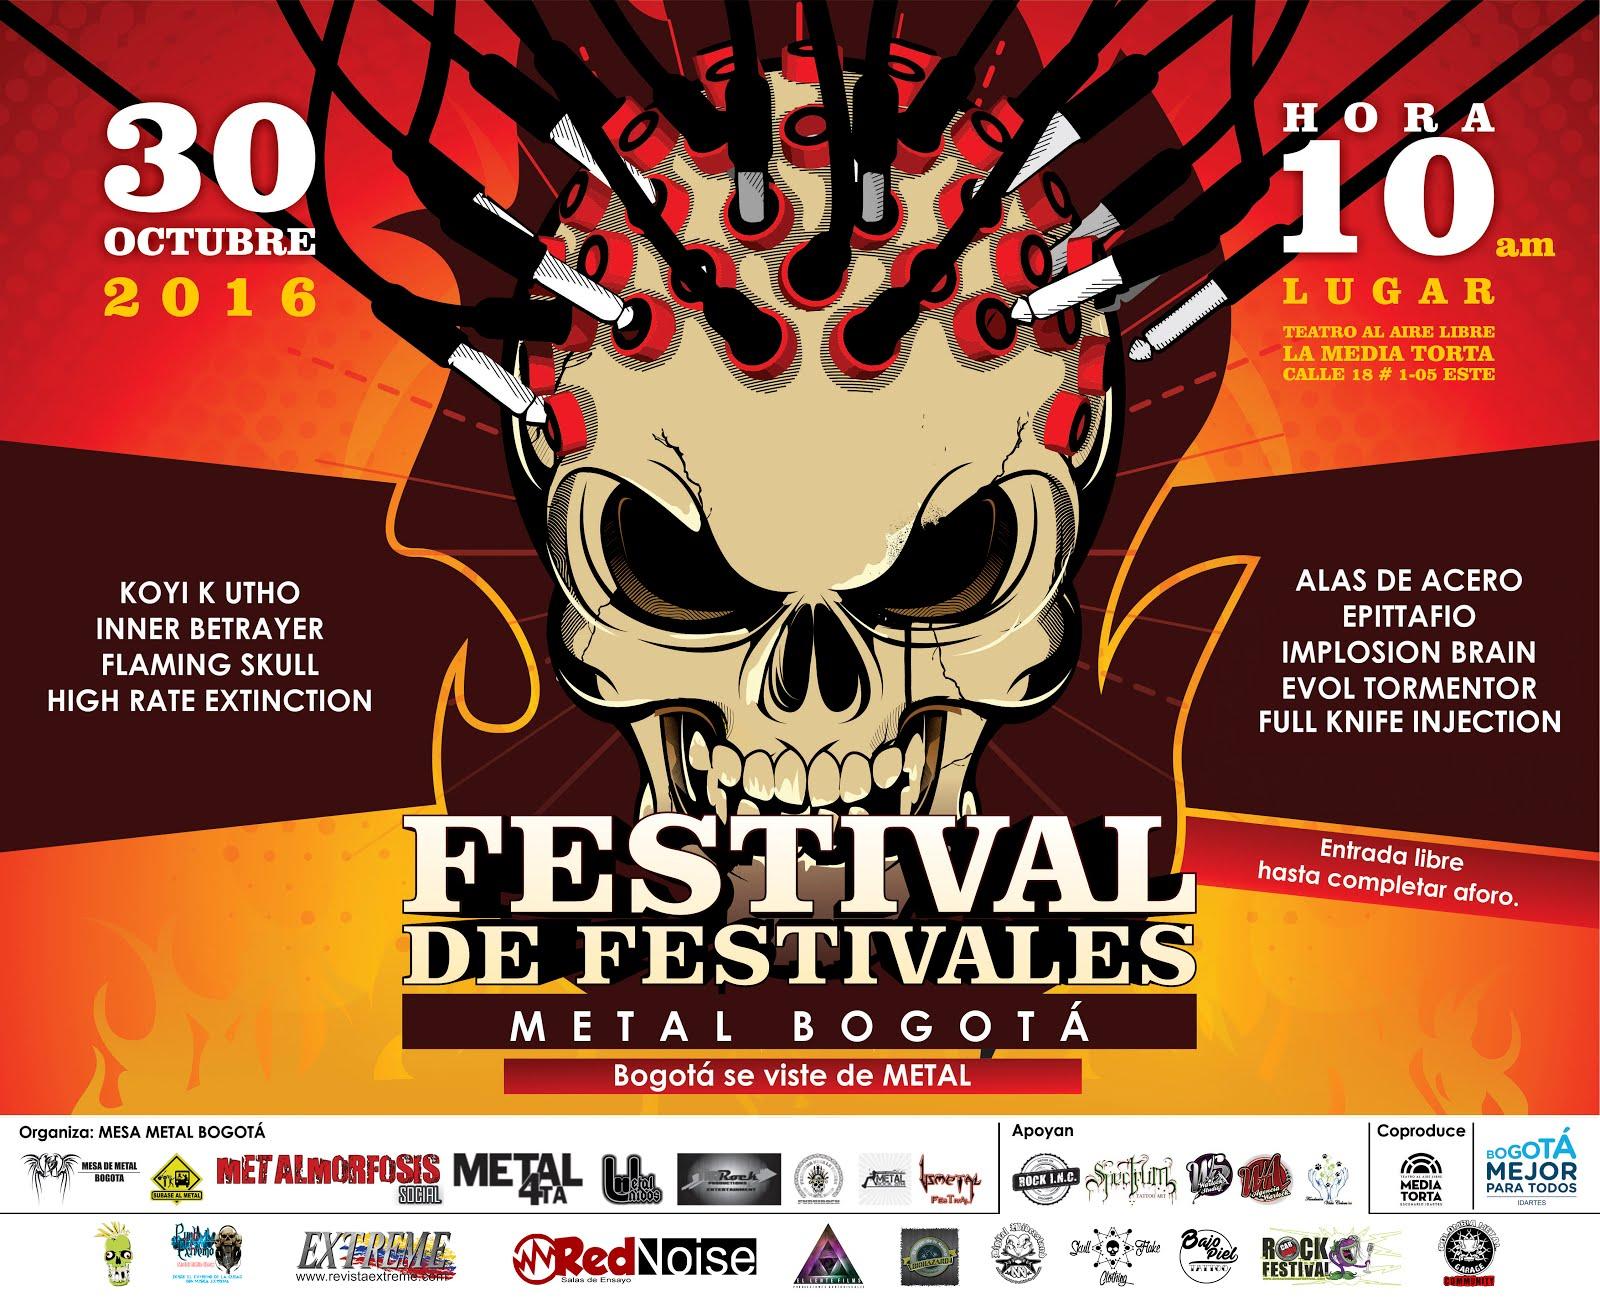 Usmetal Festival presente en FDFMB 2016 con la banda EPITTAFIO